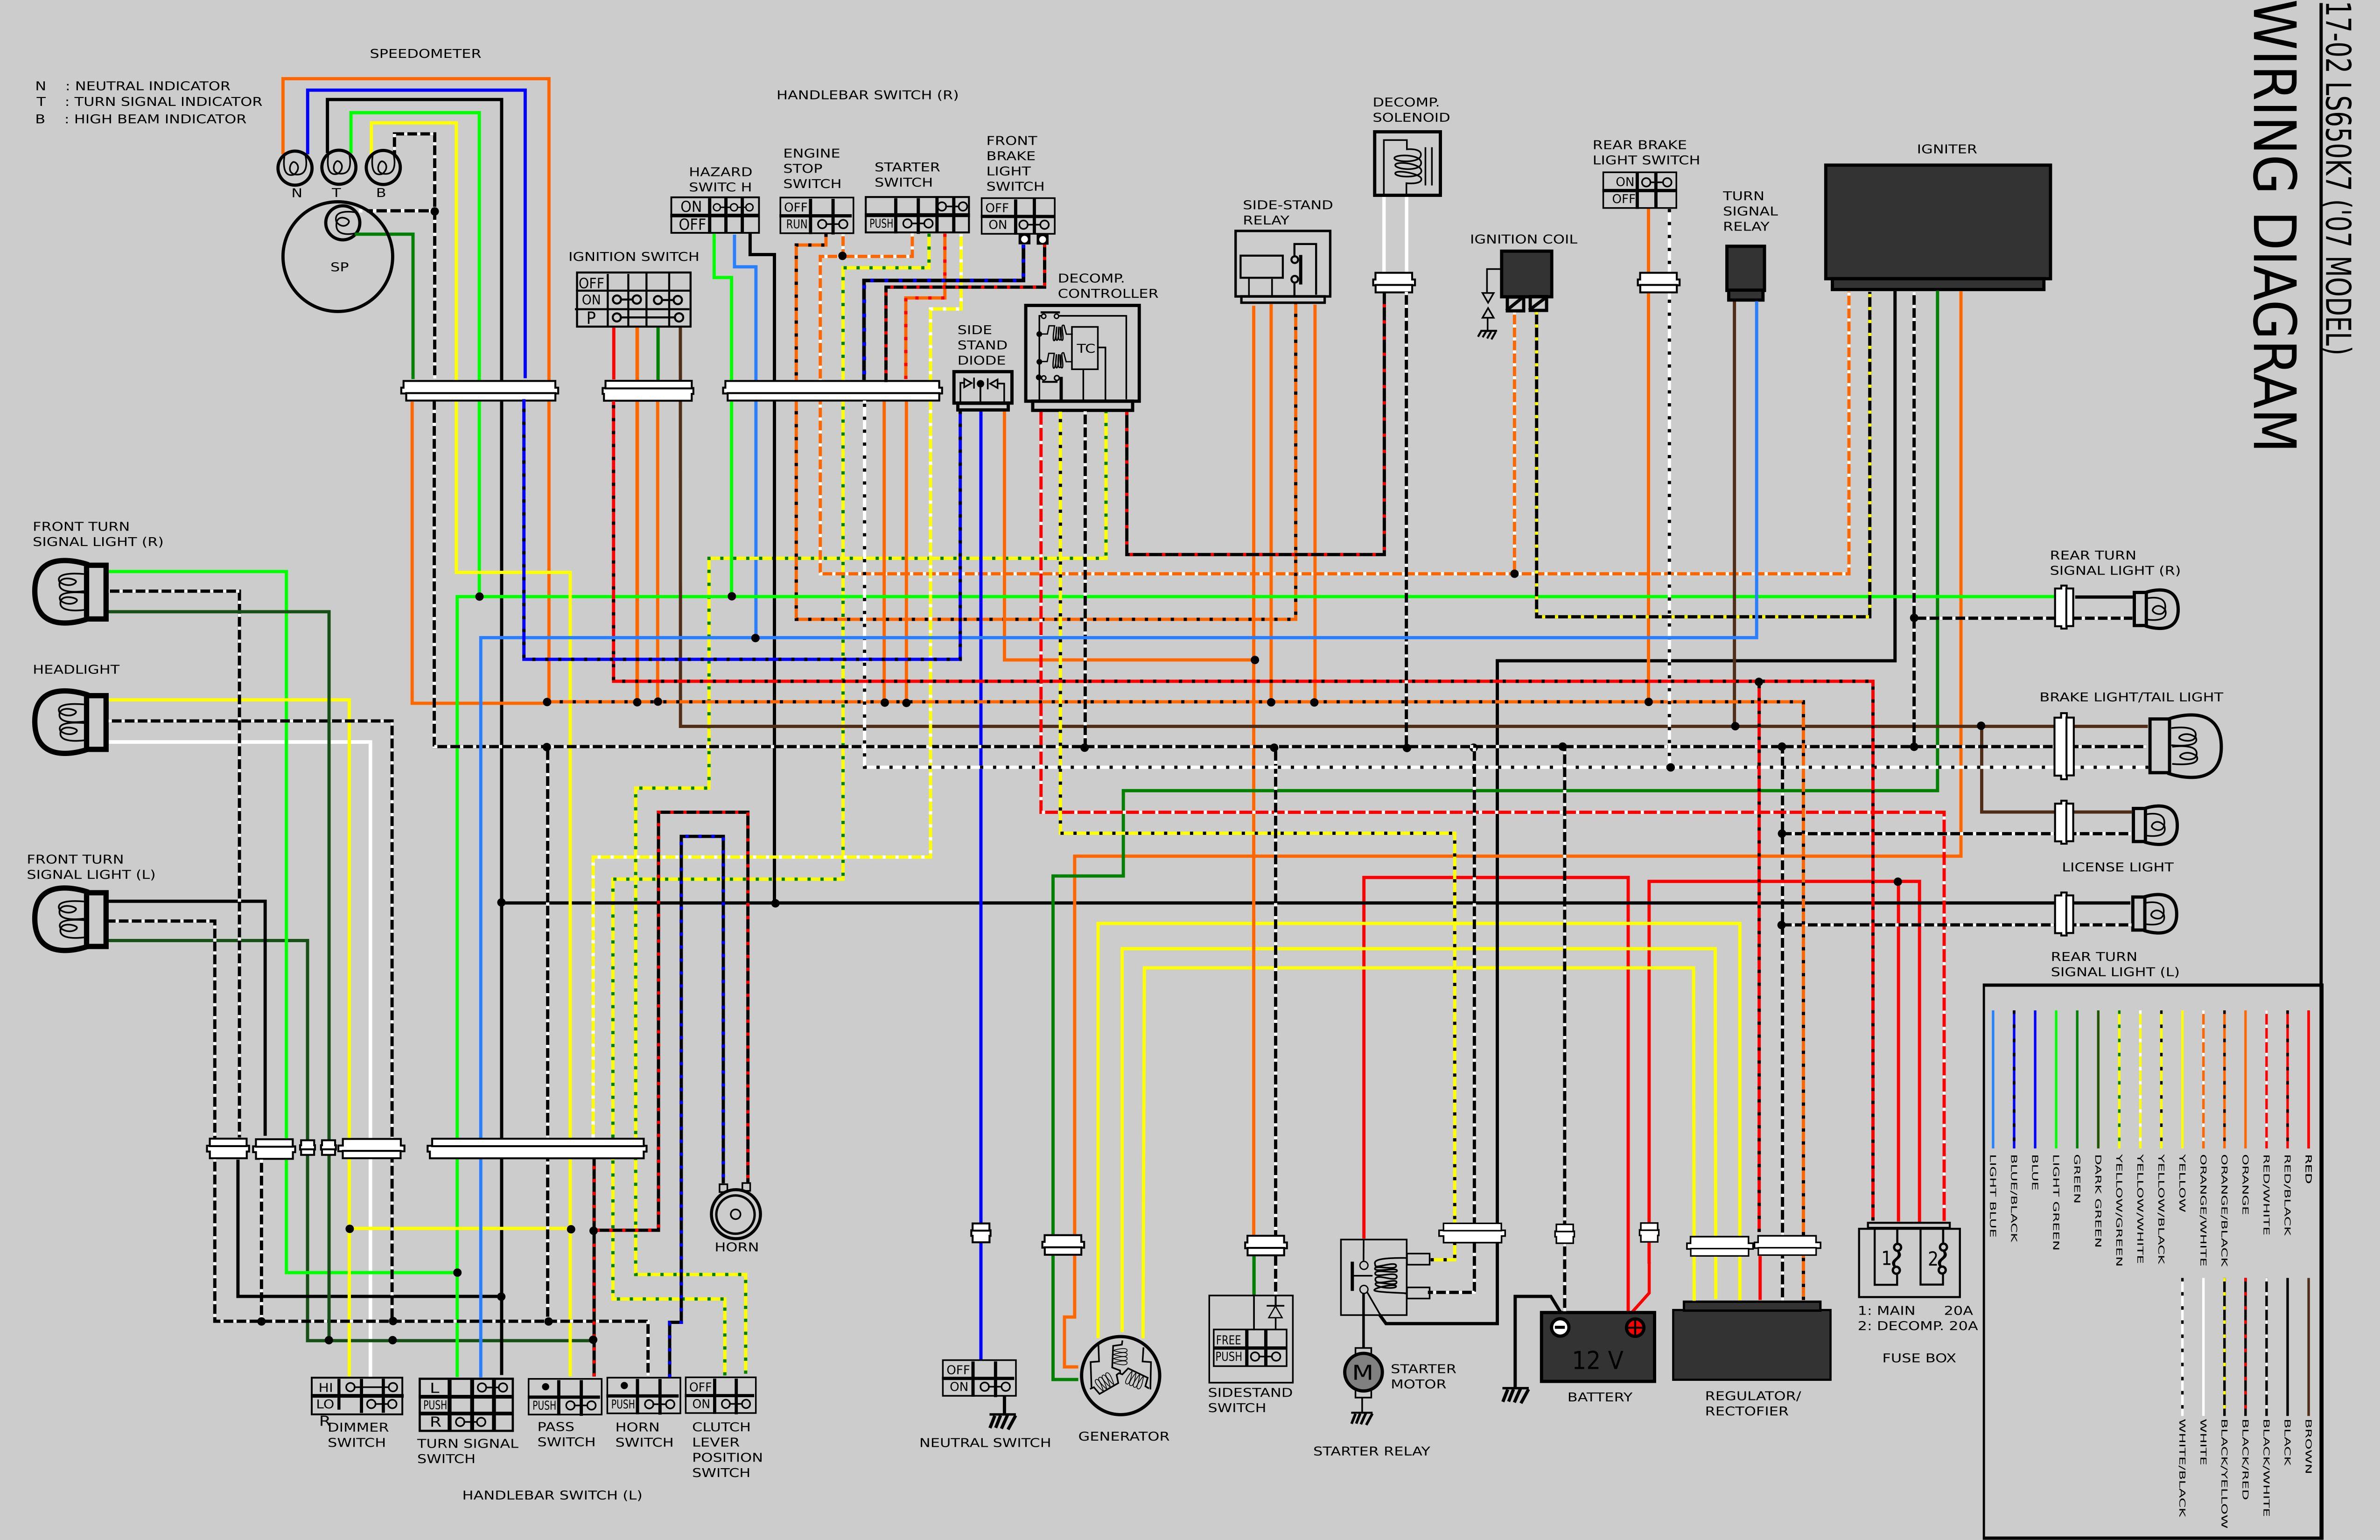 Diagram On A 2007 Suzuki Eiger Wiring Diagram Full Version Hd Quality Wiring Diagram Diagramfeelye Gisbertovalori It